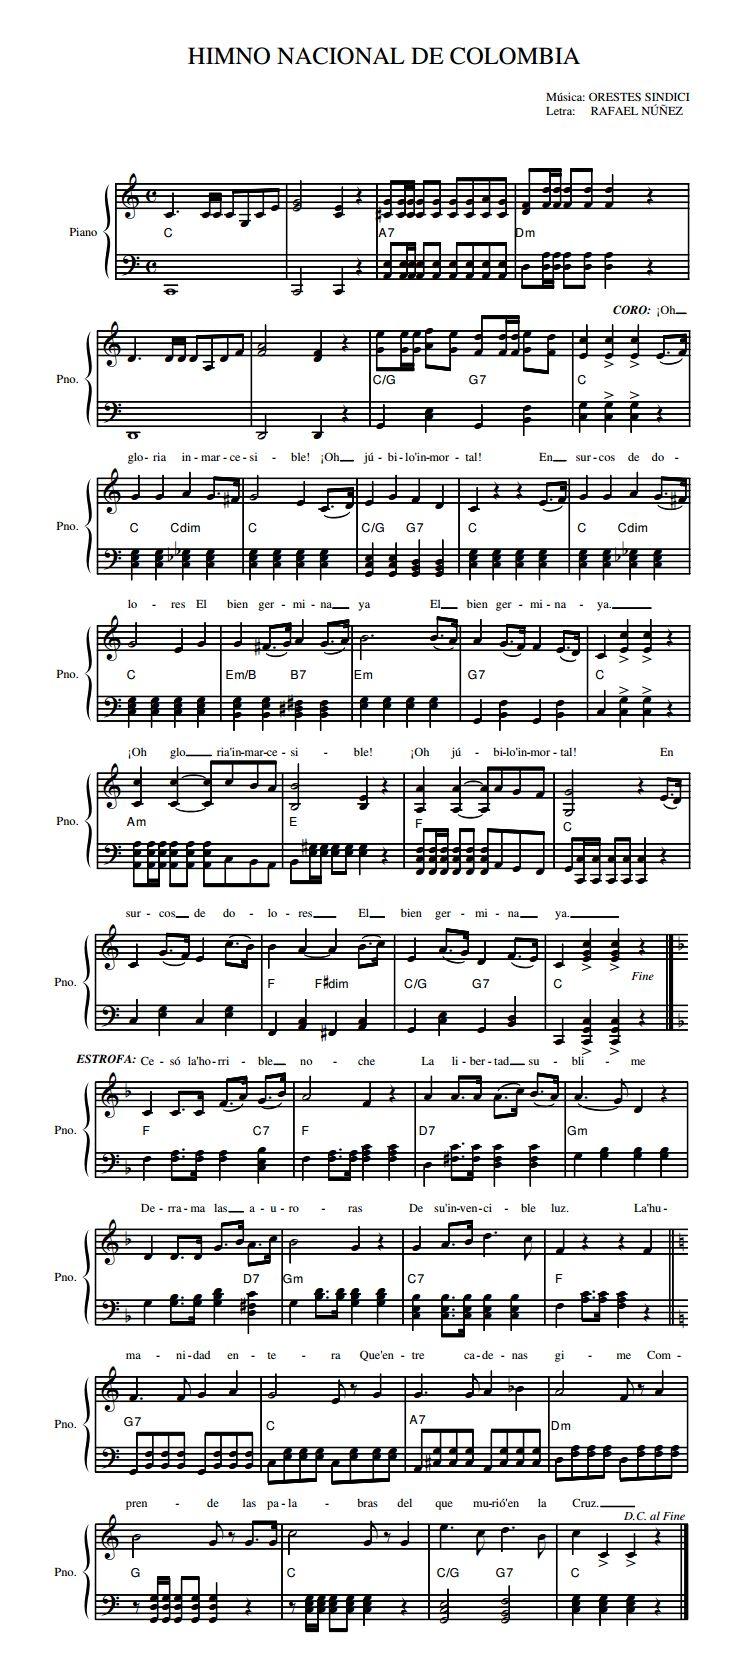 "Partitura del Himno Nacional de la República de Colombia - ""¡Oh gloria inmarcesible!"" / Sheet music of the National Anthem of Colombia - ""Oh, Unfading Glory!"""